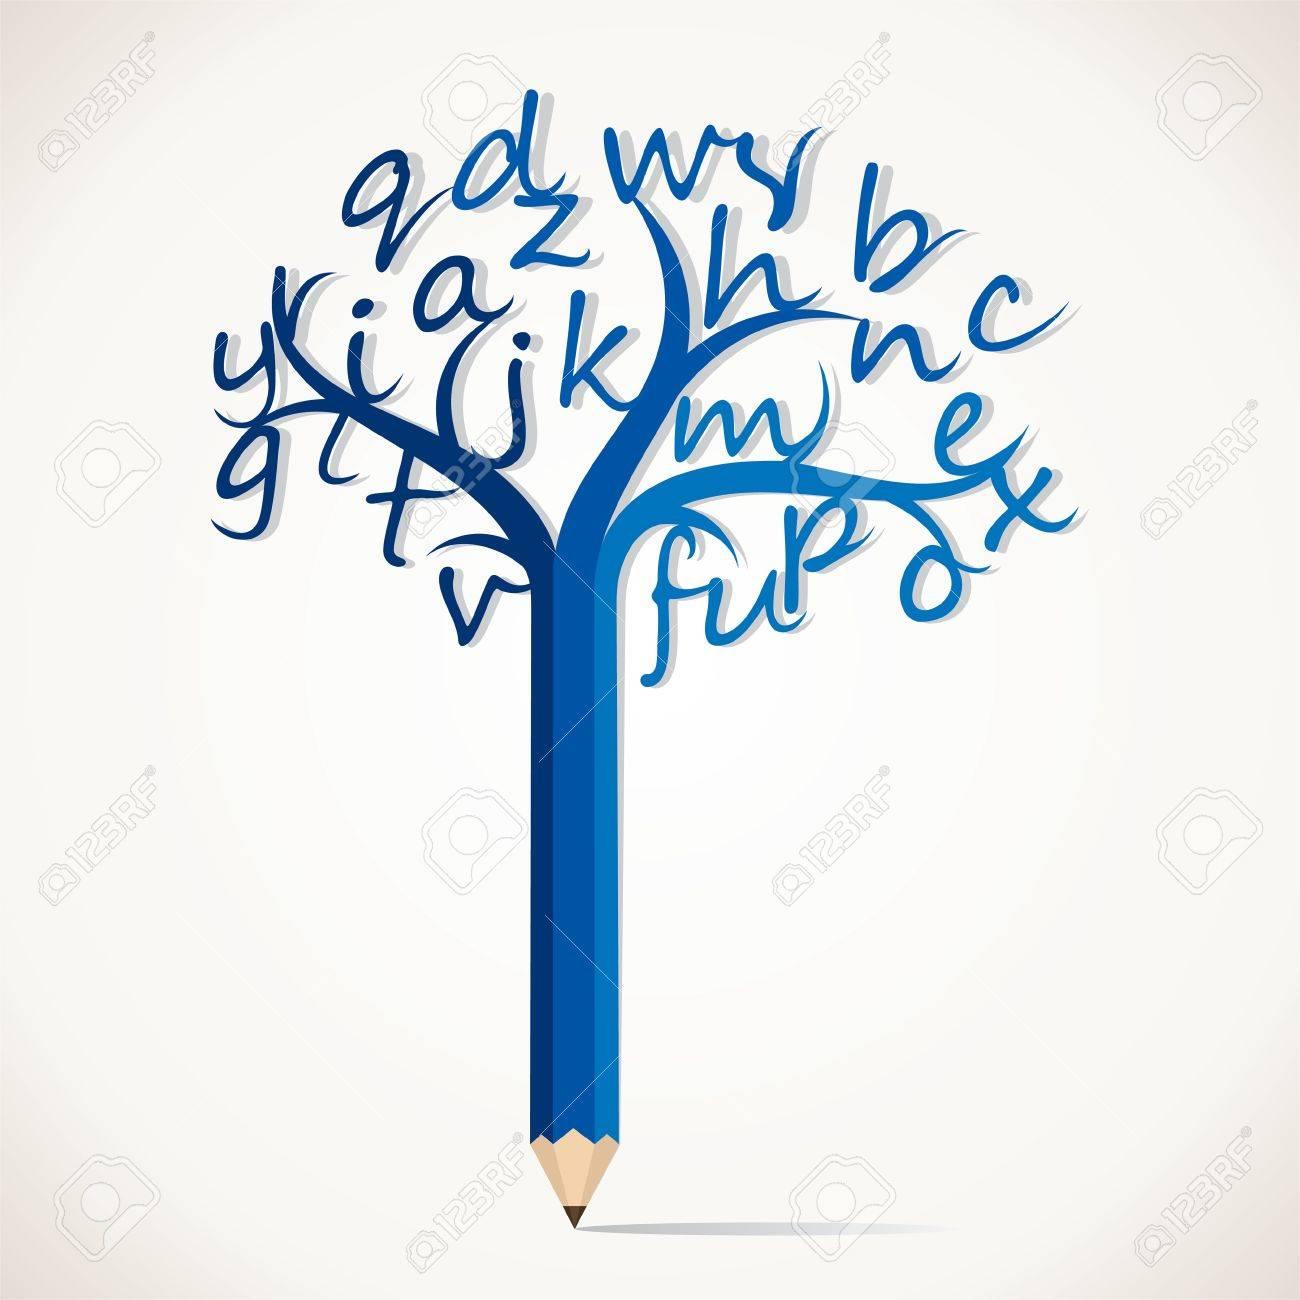 alphabetical tree stock royalty cliparts vectors and stock vector alphabetical tree stock